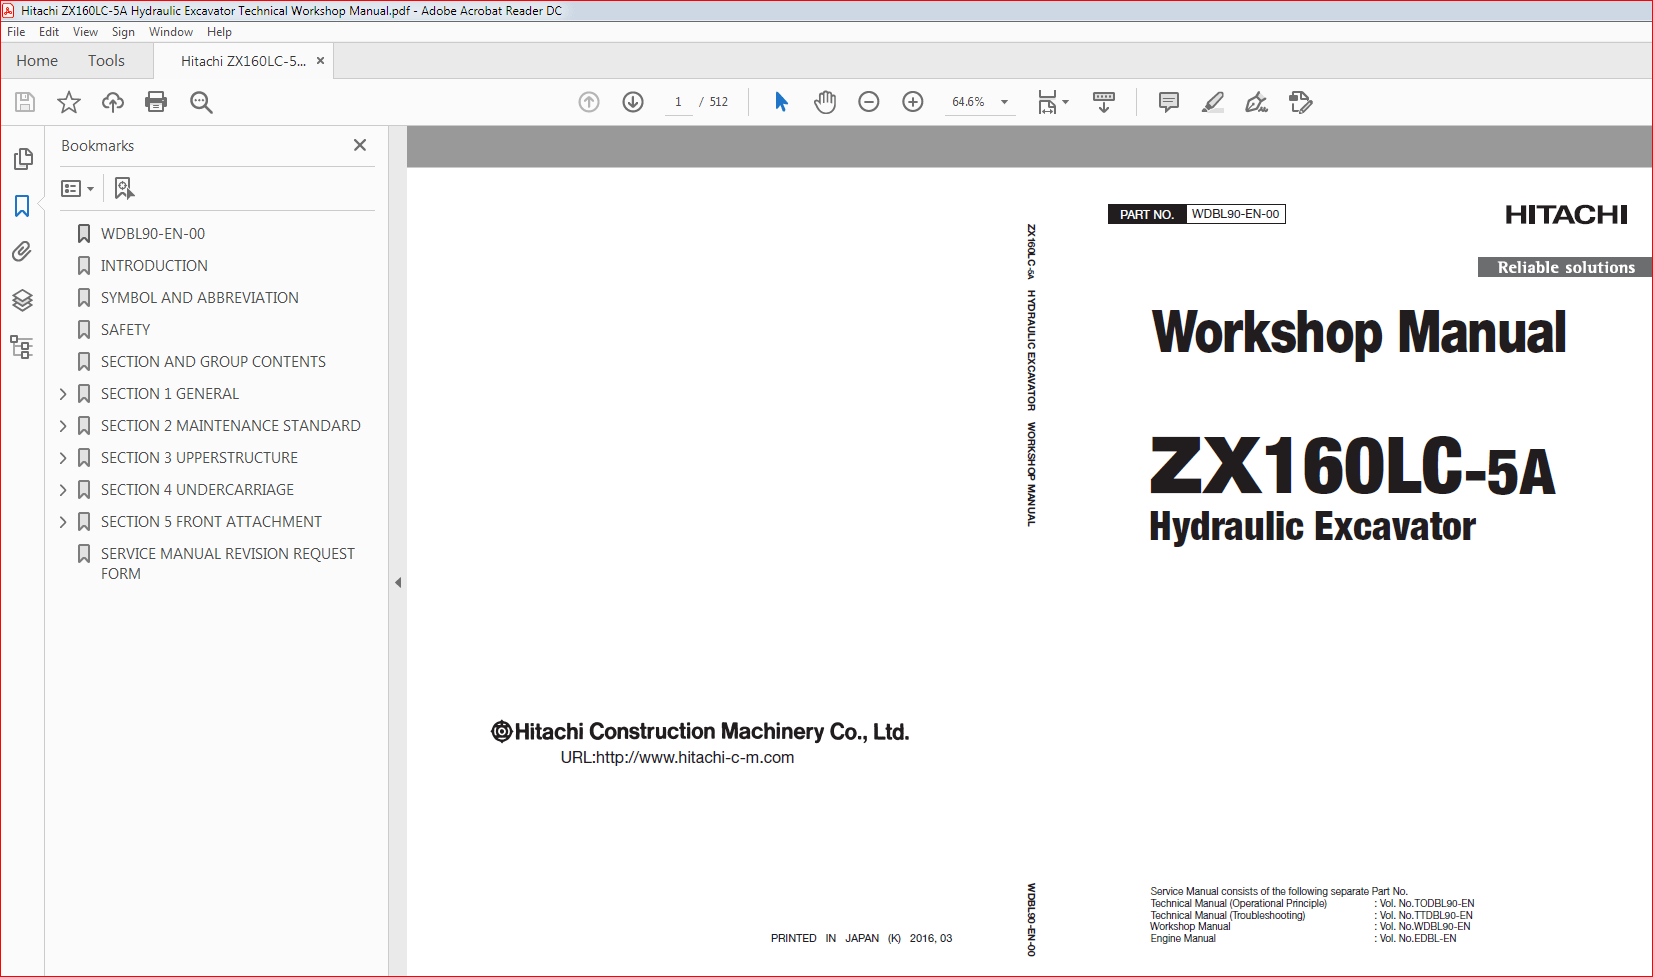 Hitachi ZX160LC-5A Hydraulic Excavator Technical Workshop